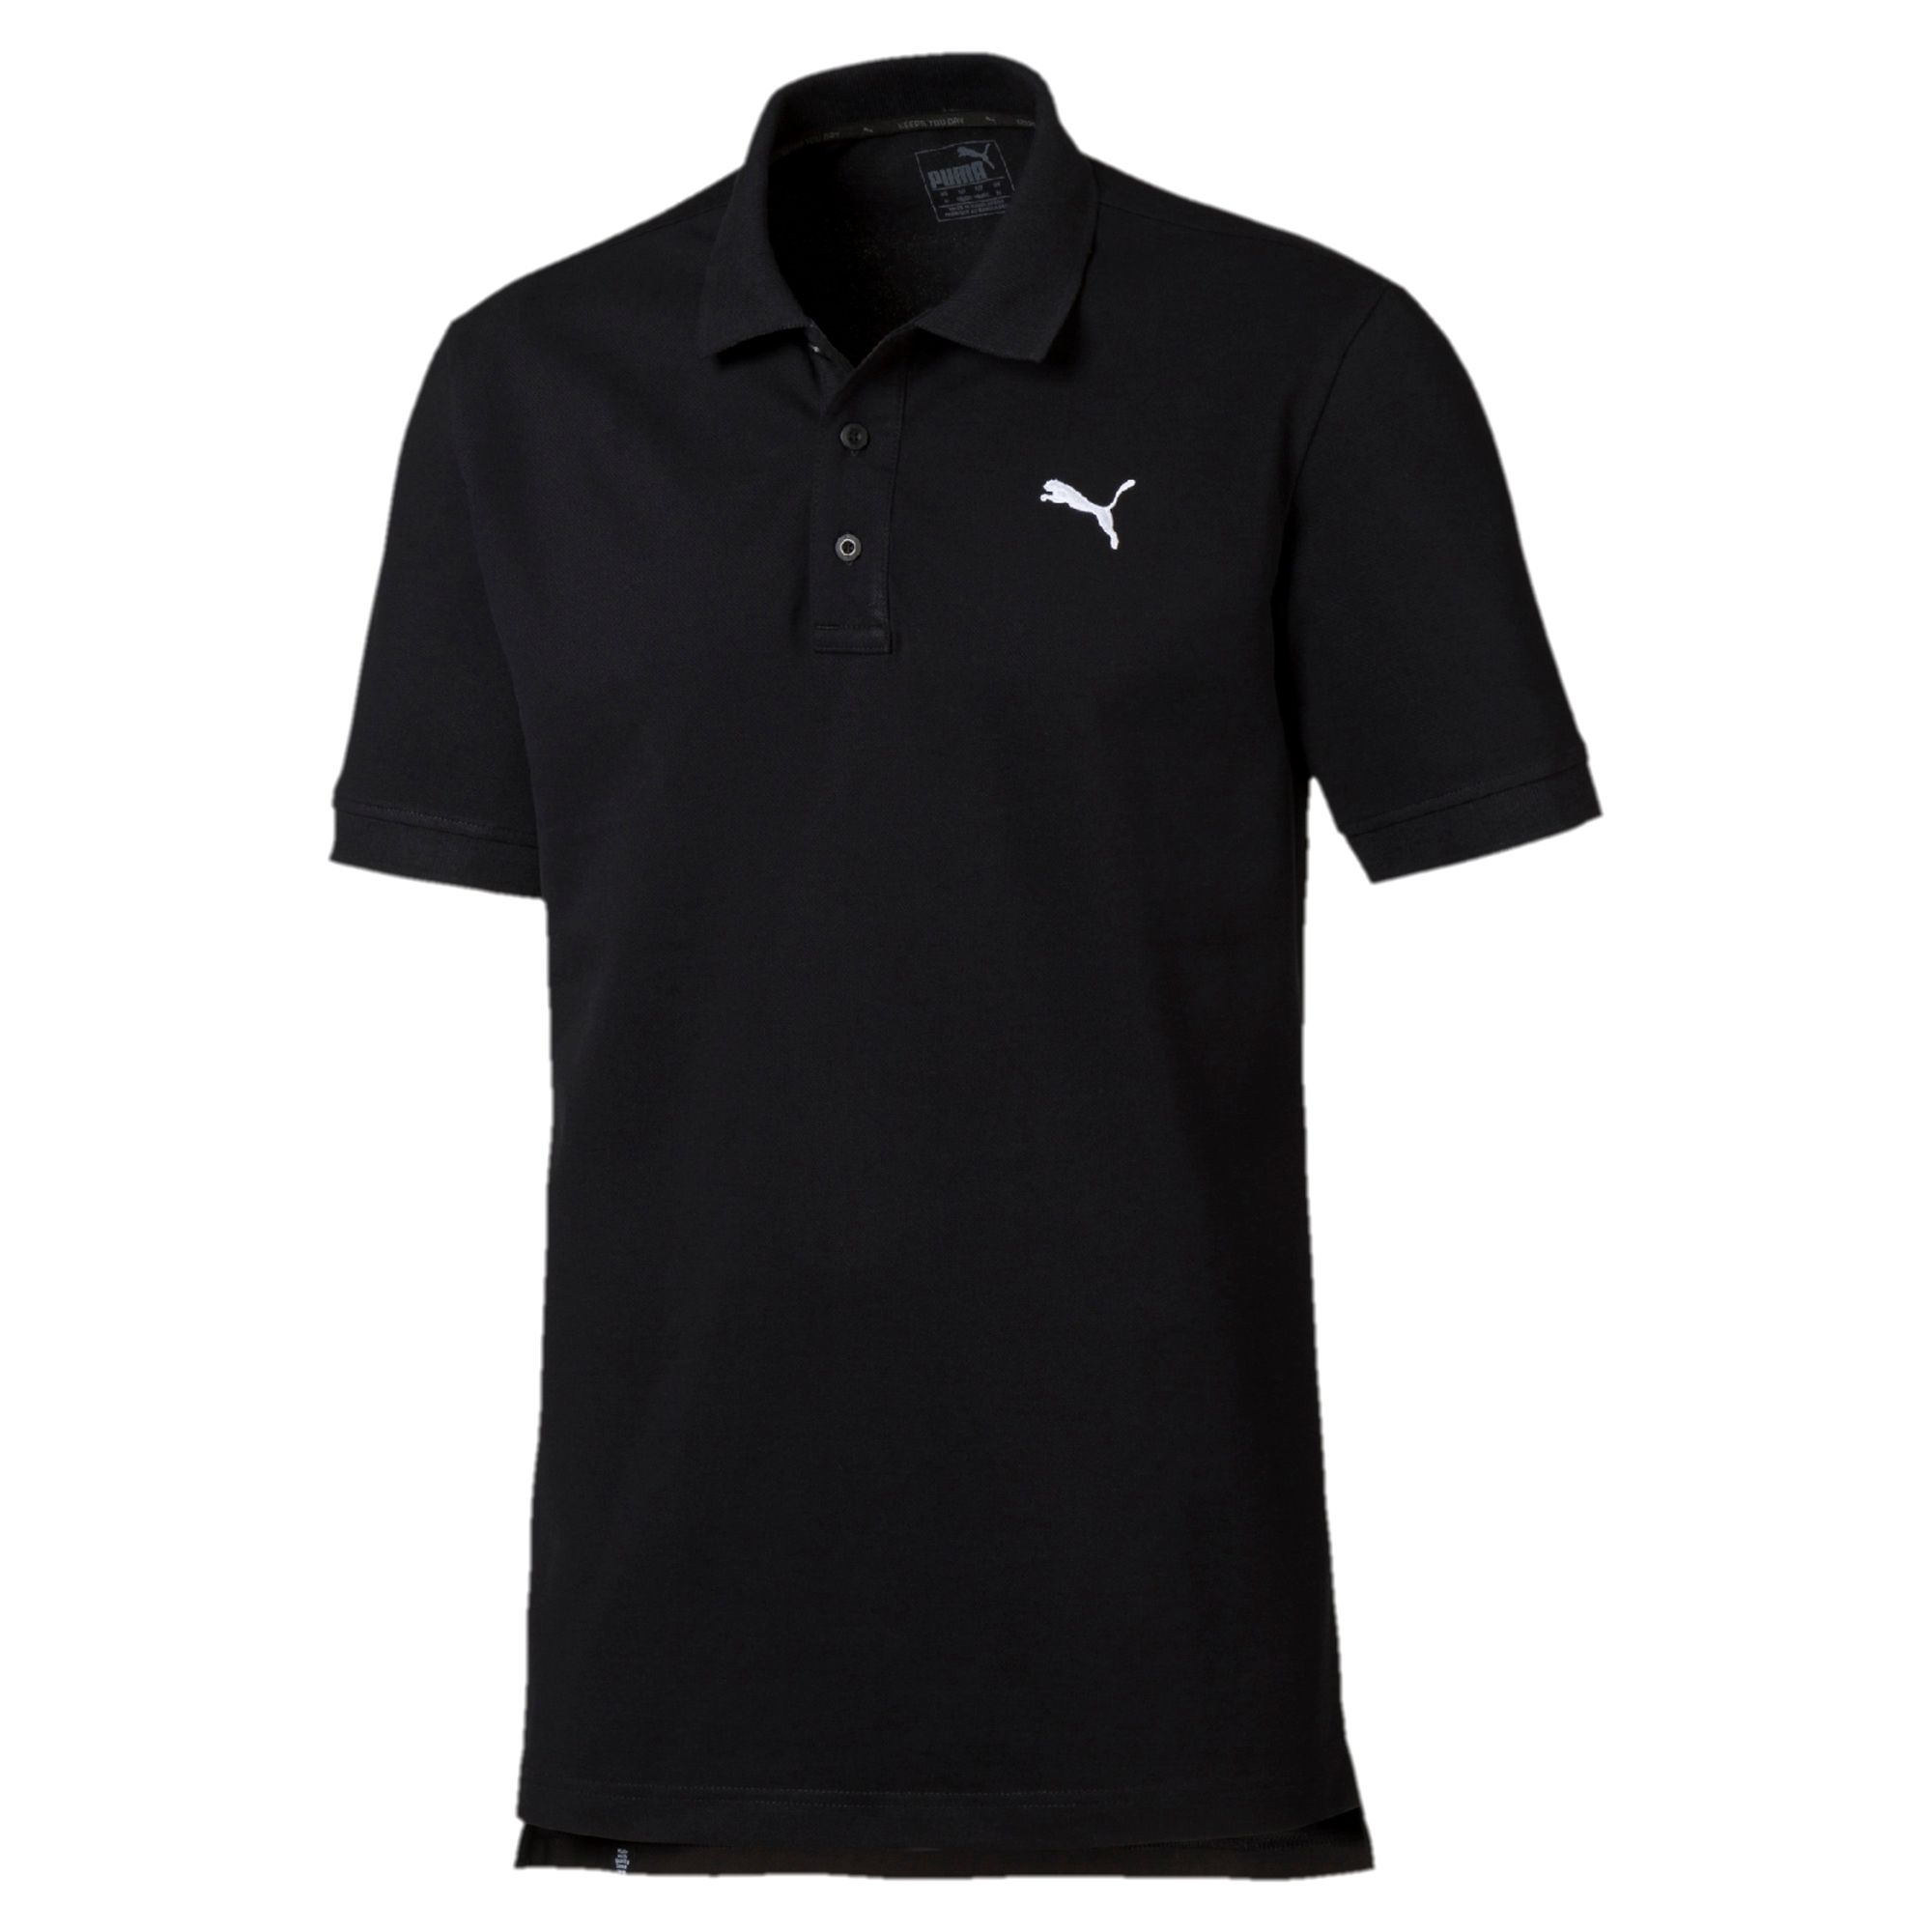 Puma ESS Pique Polo Cotton Black koszulka